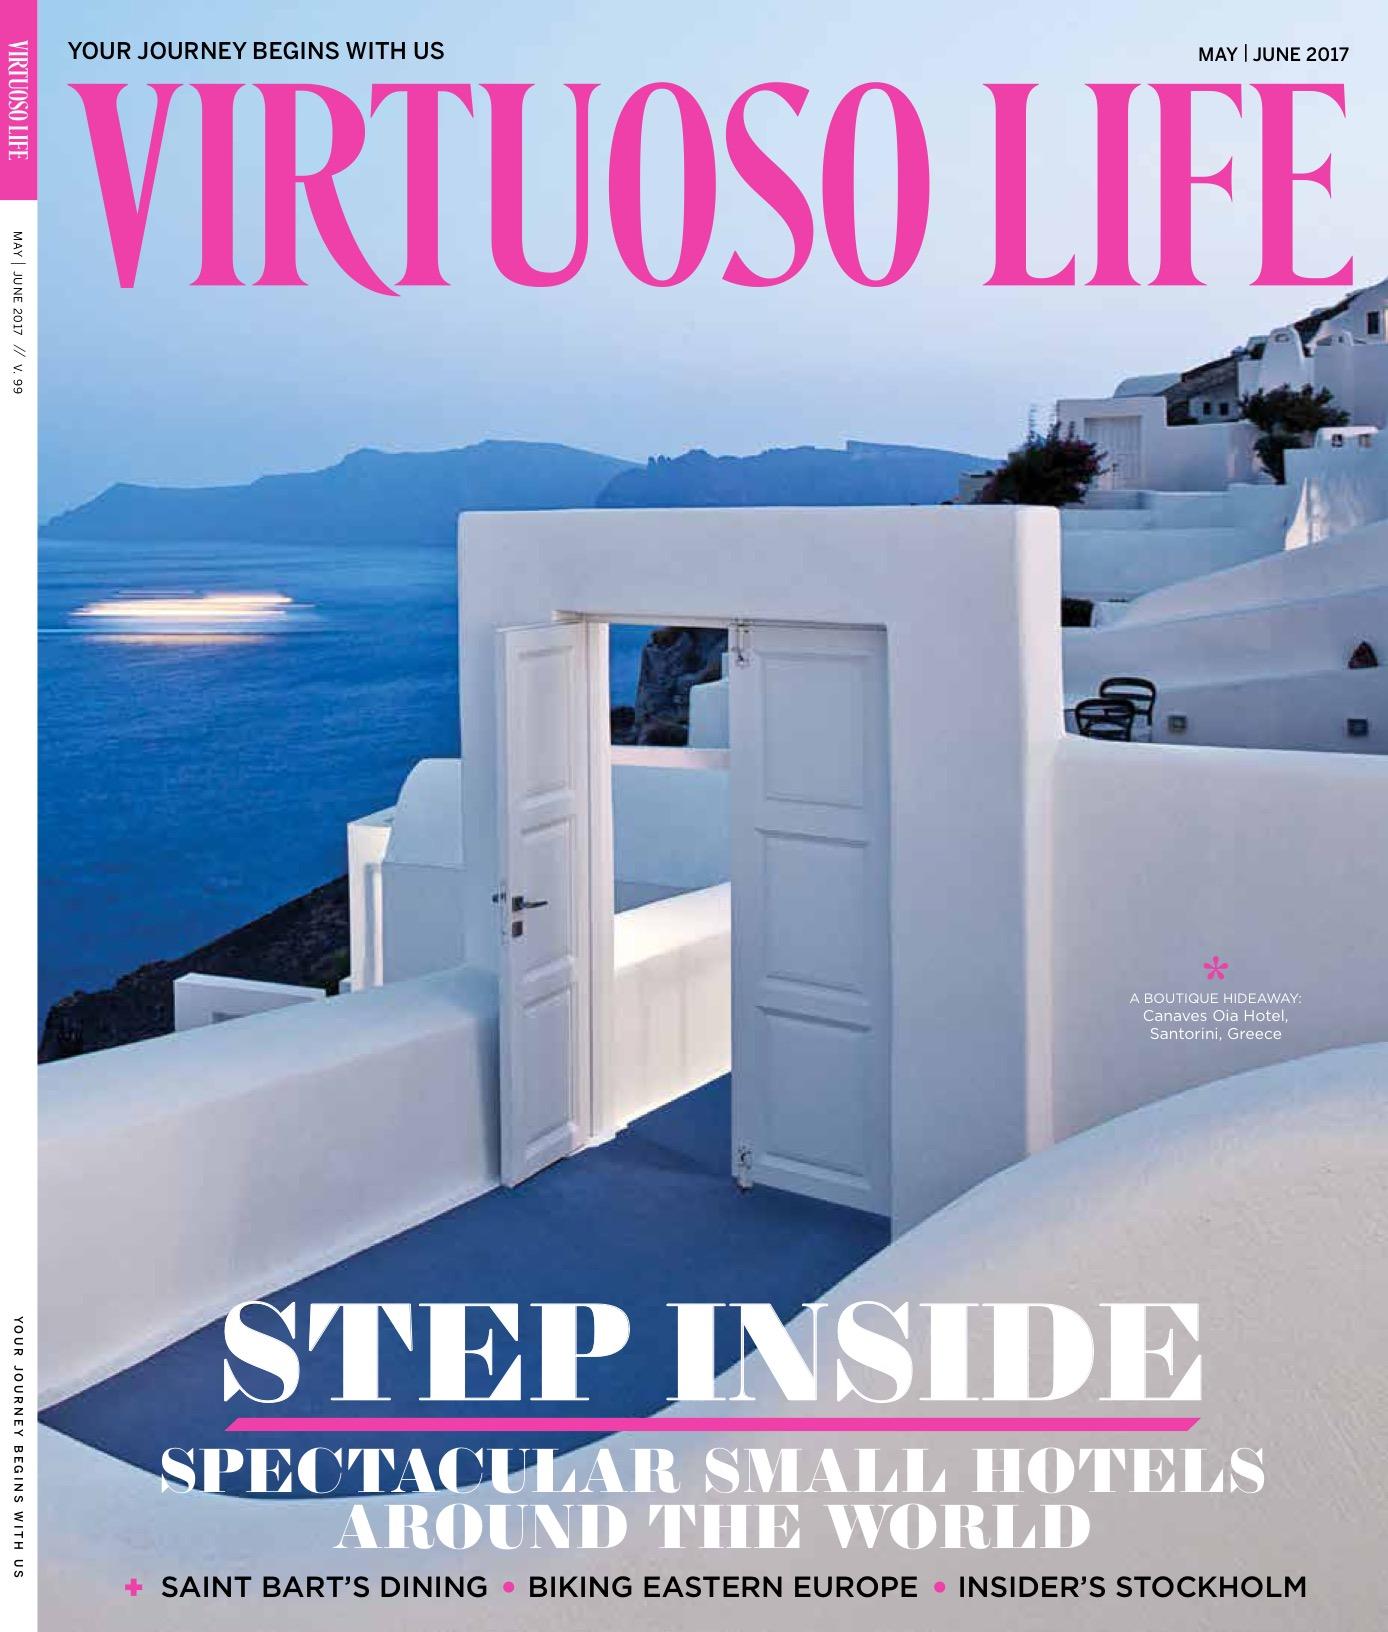 Virtuoso Life MayJune 2017